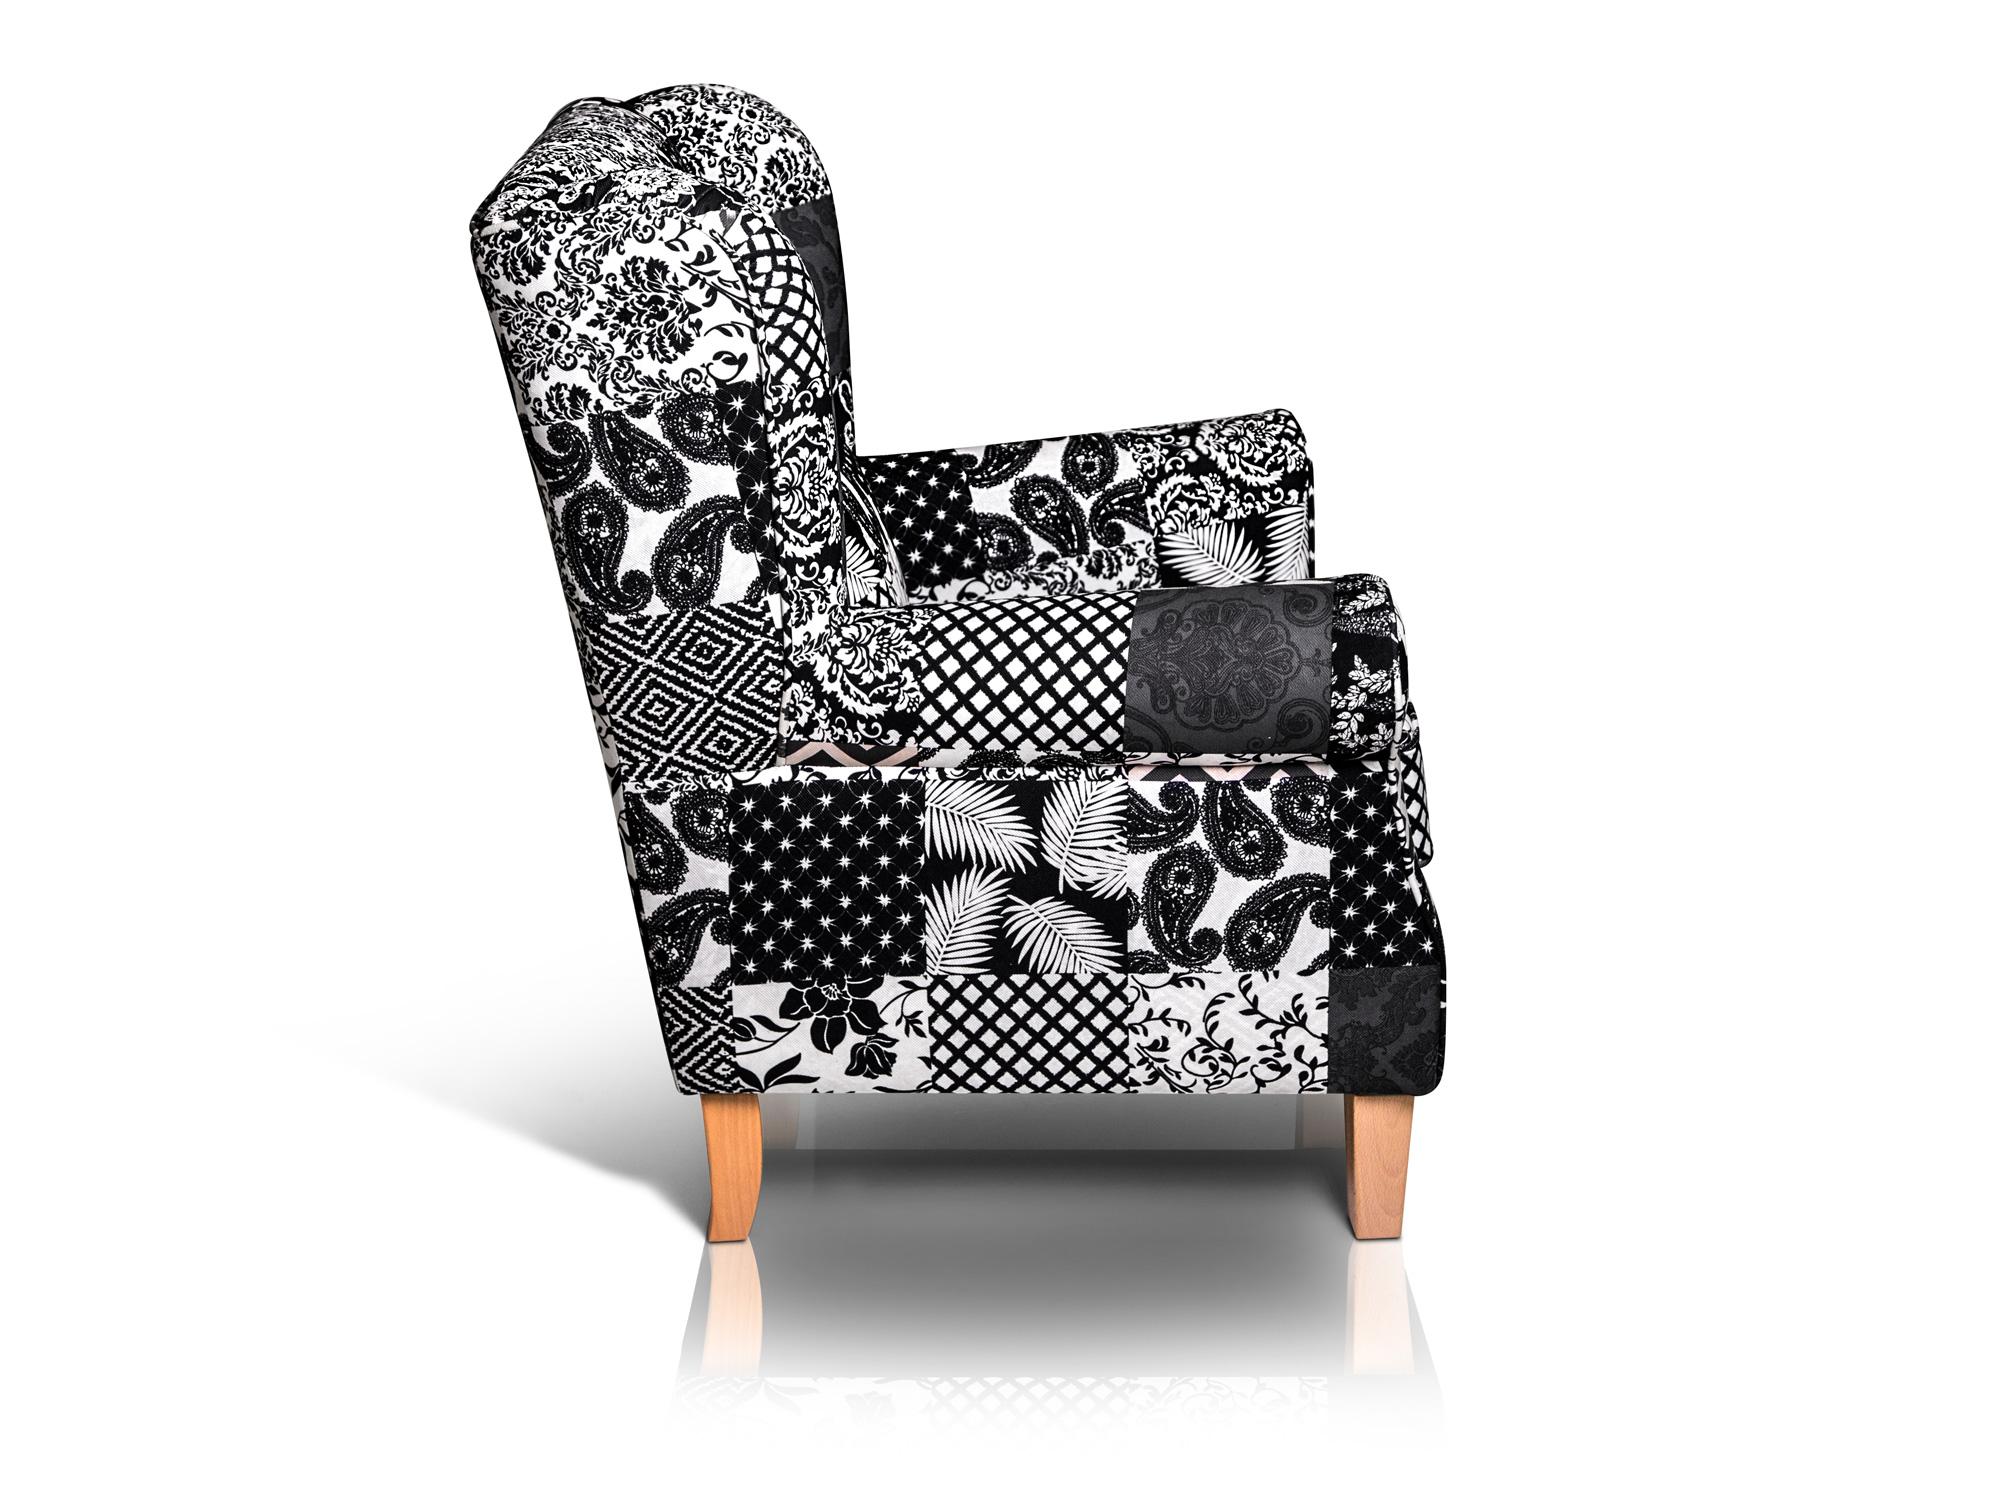 ohrensessel willy patchwork schwarz 9022. Black Bedroom Furniture Sets. Home Design Ideas